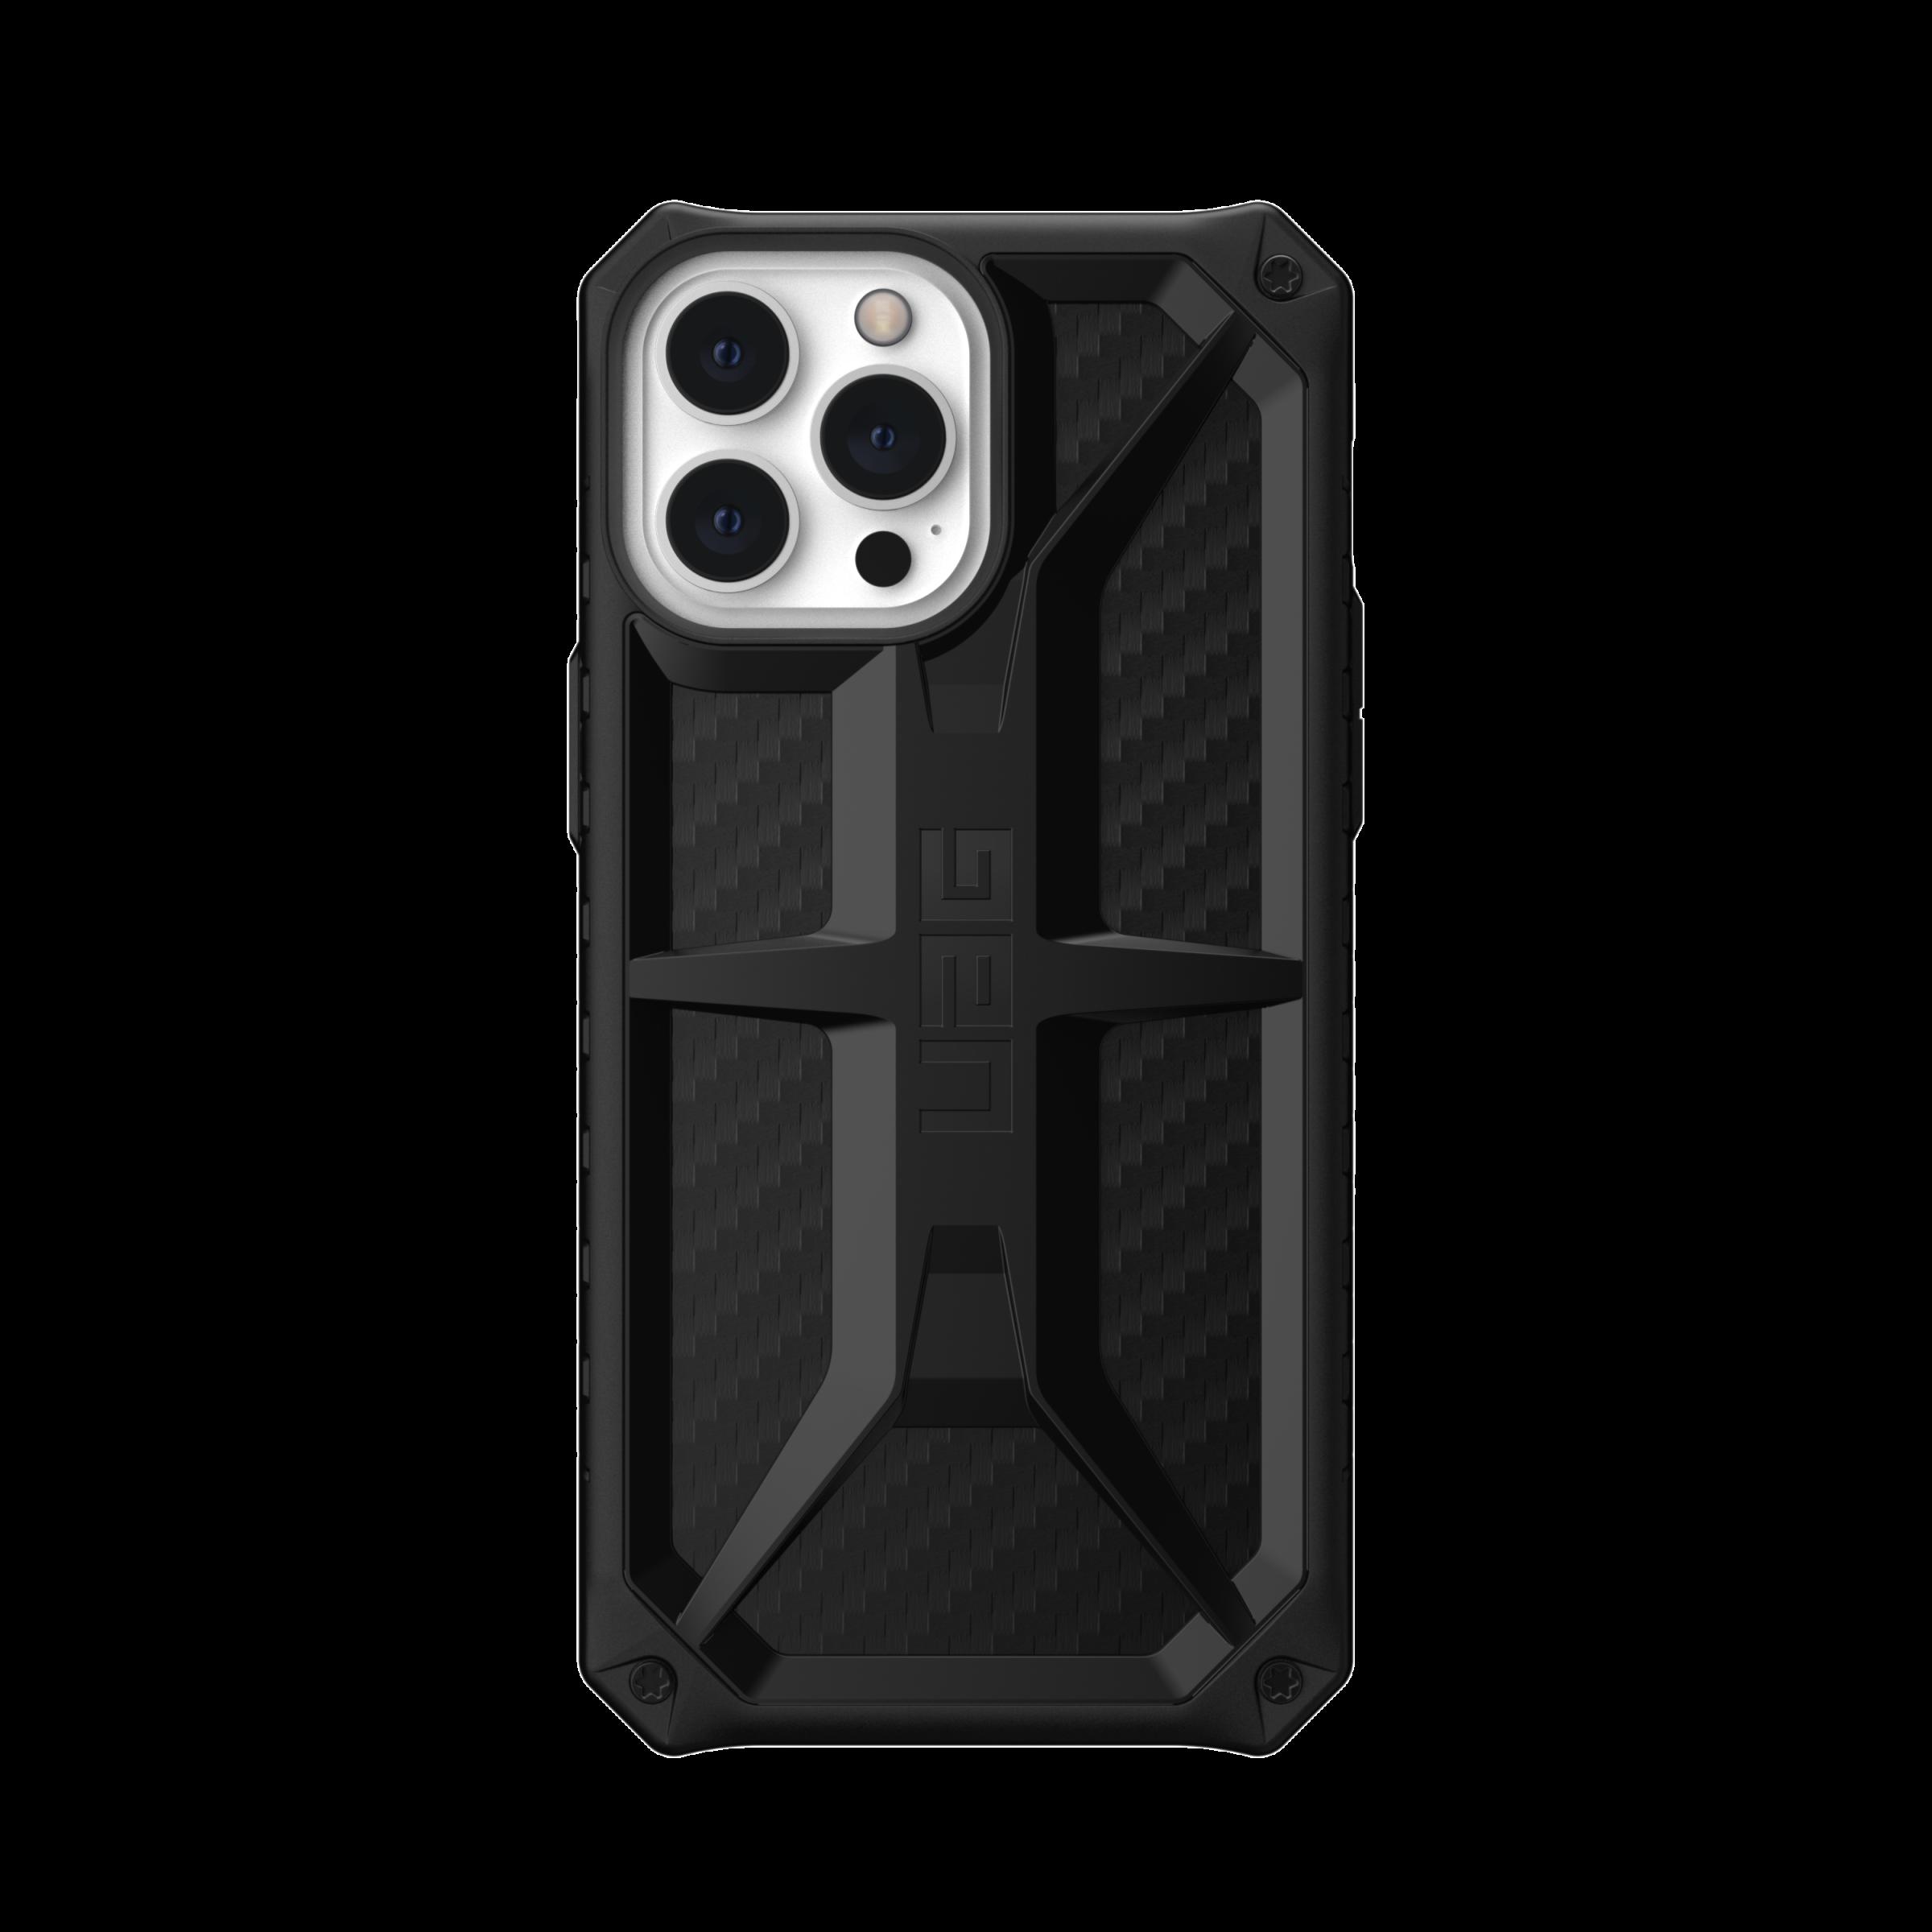 Monarch Series Case iPhone 13 Pro Max Carbon Fiber